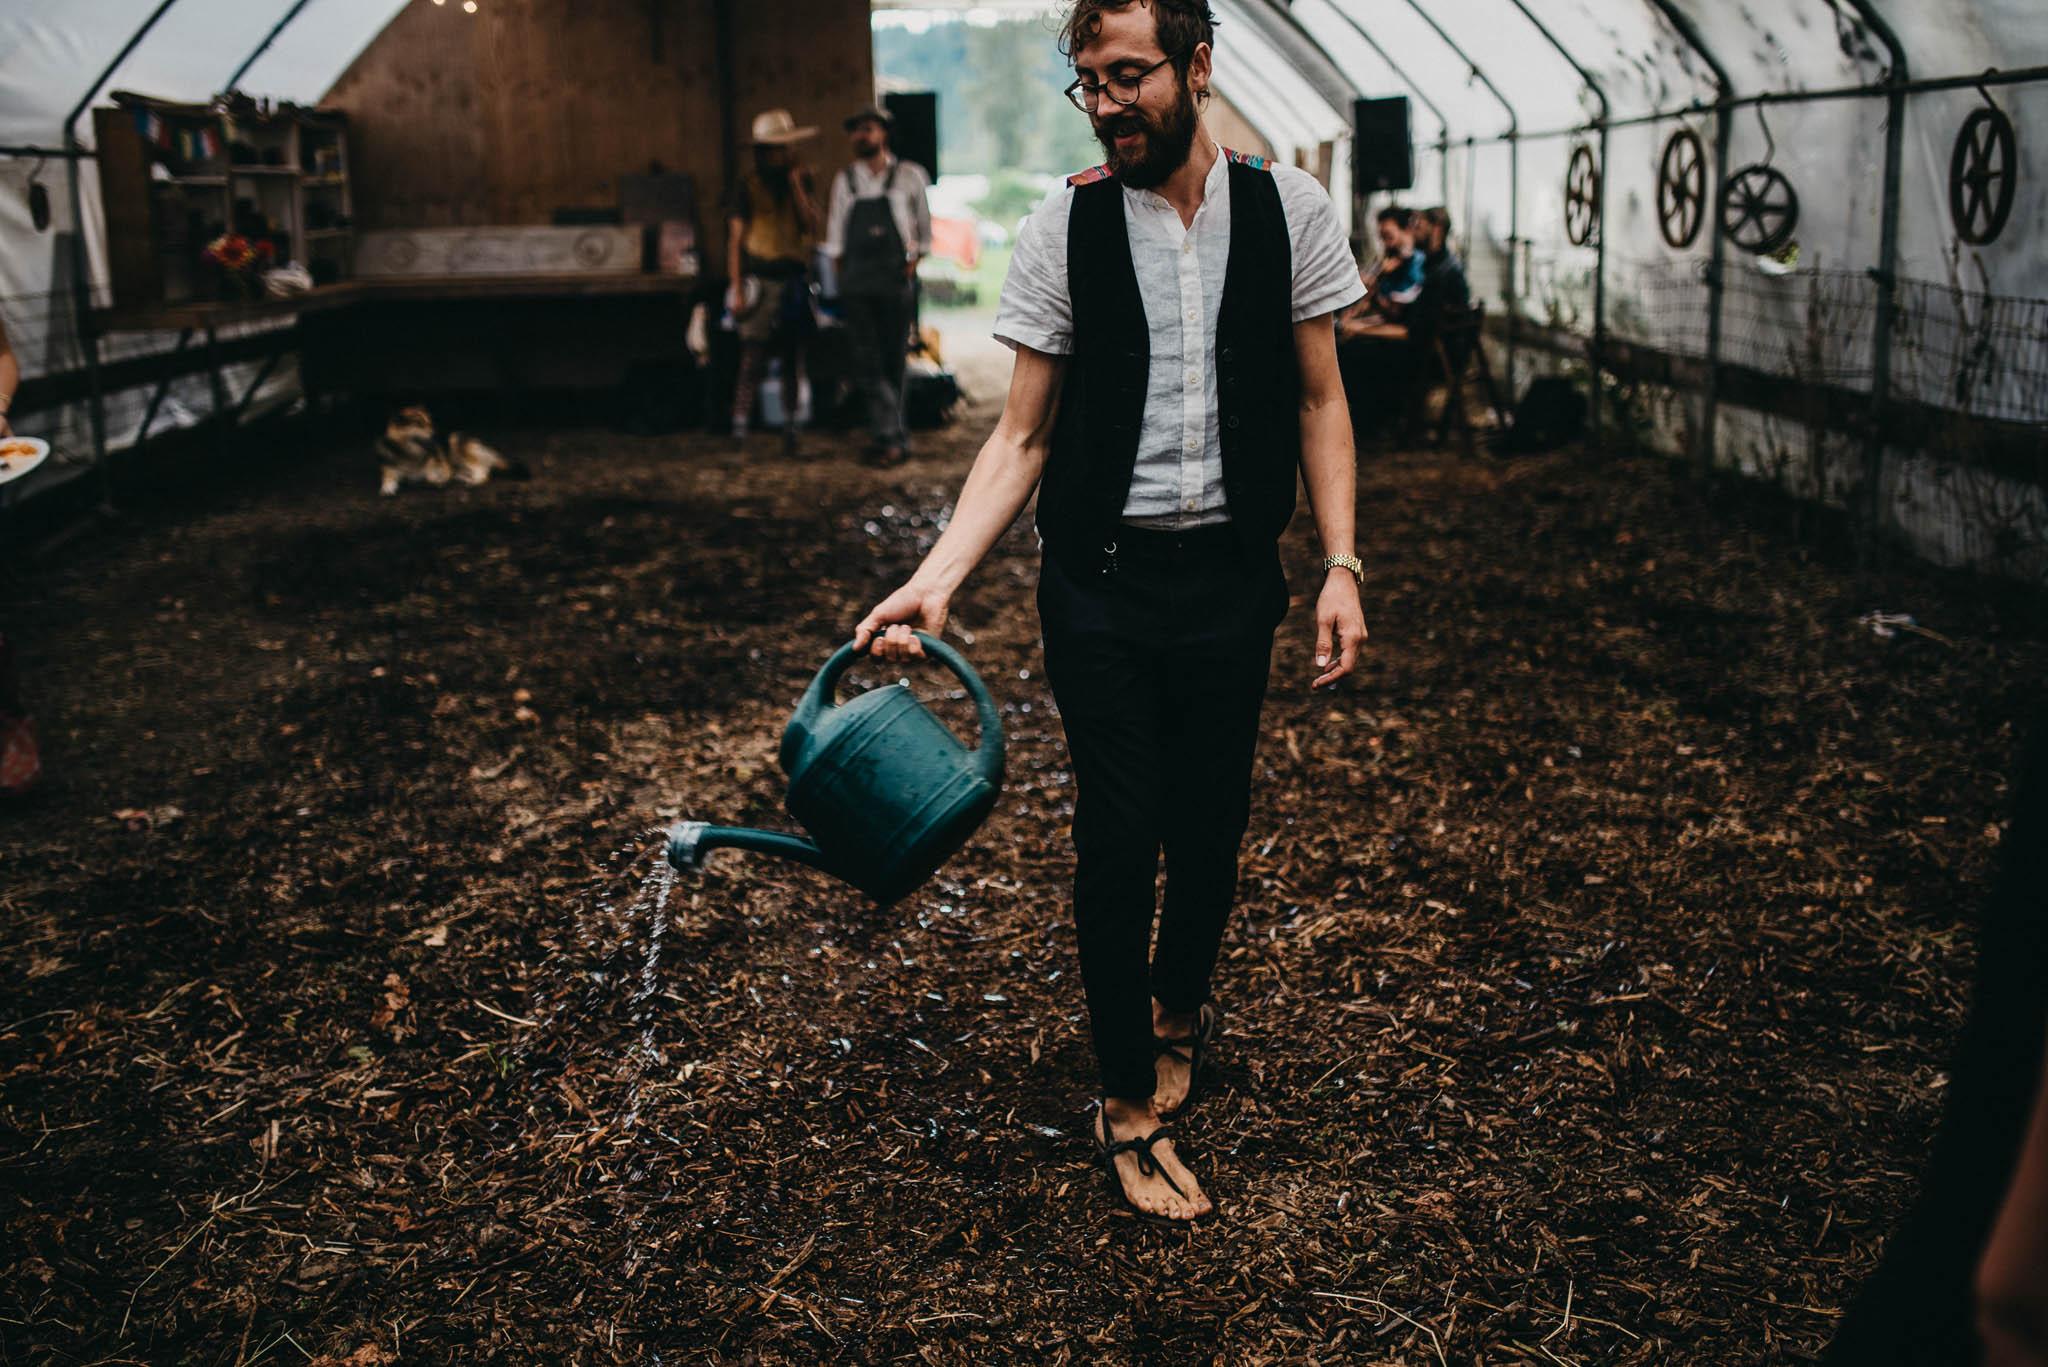 preparing dirt dance floor at farm wedding